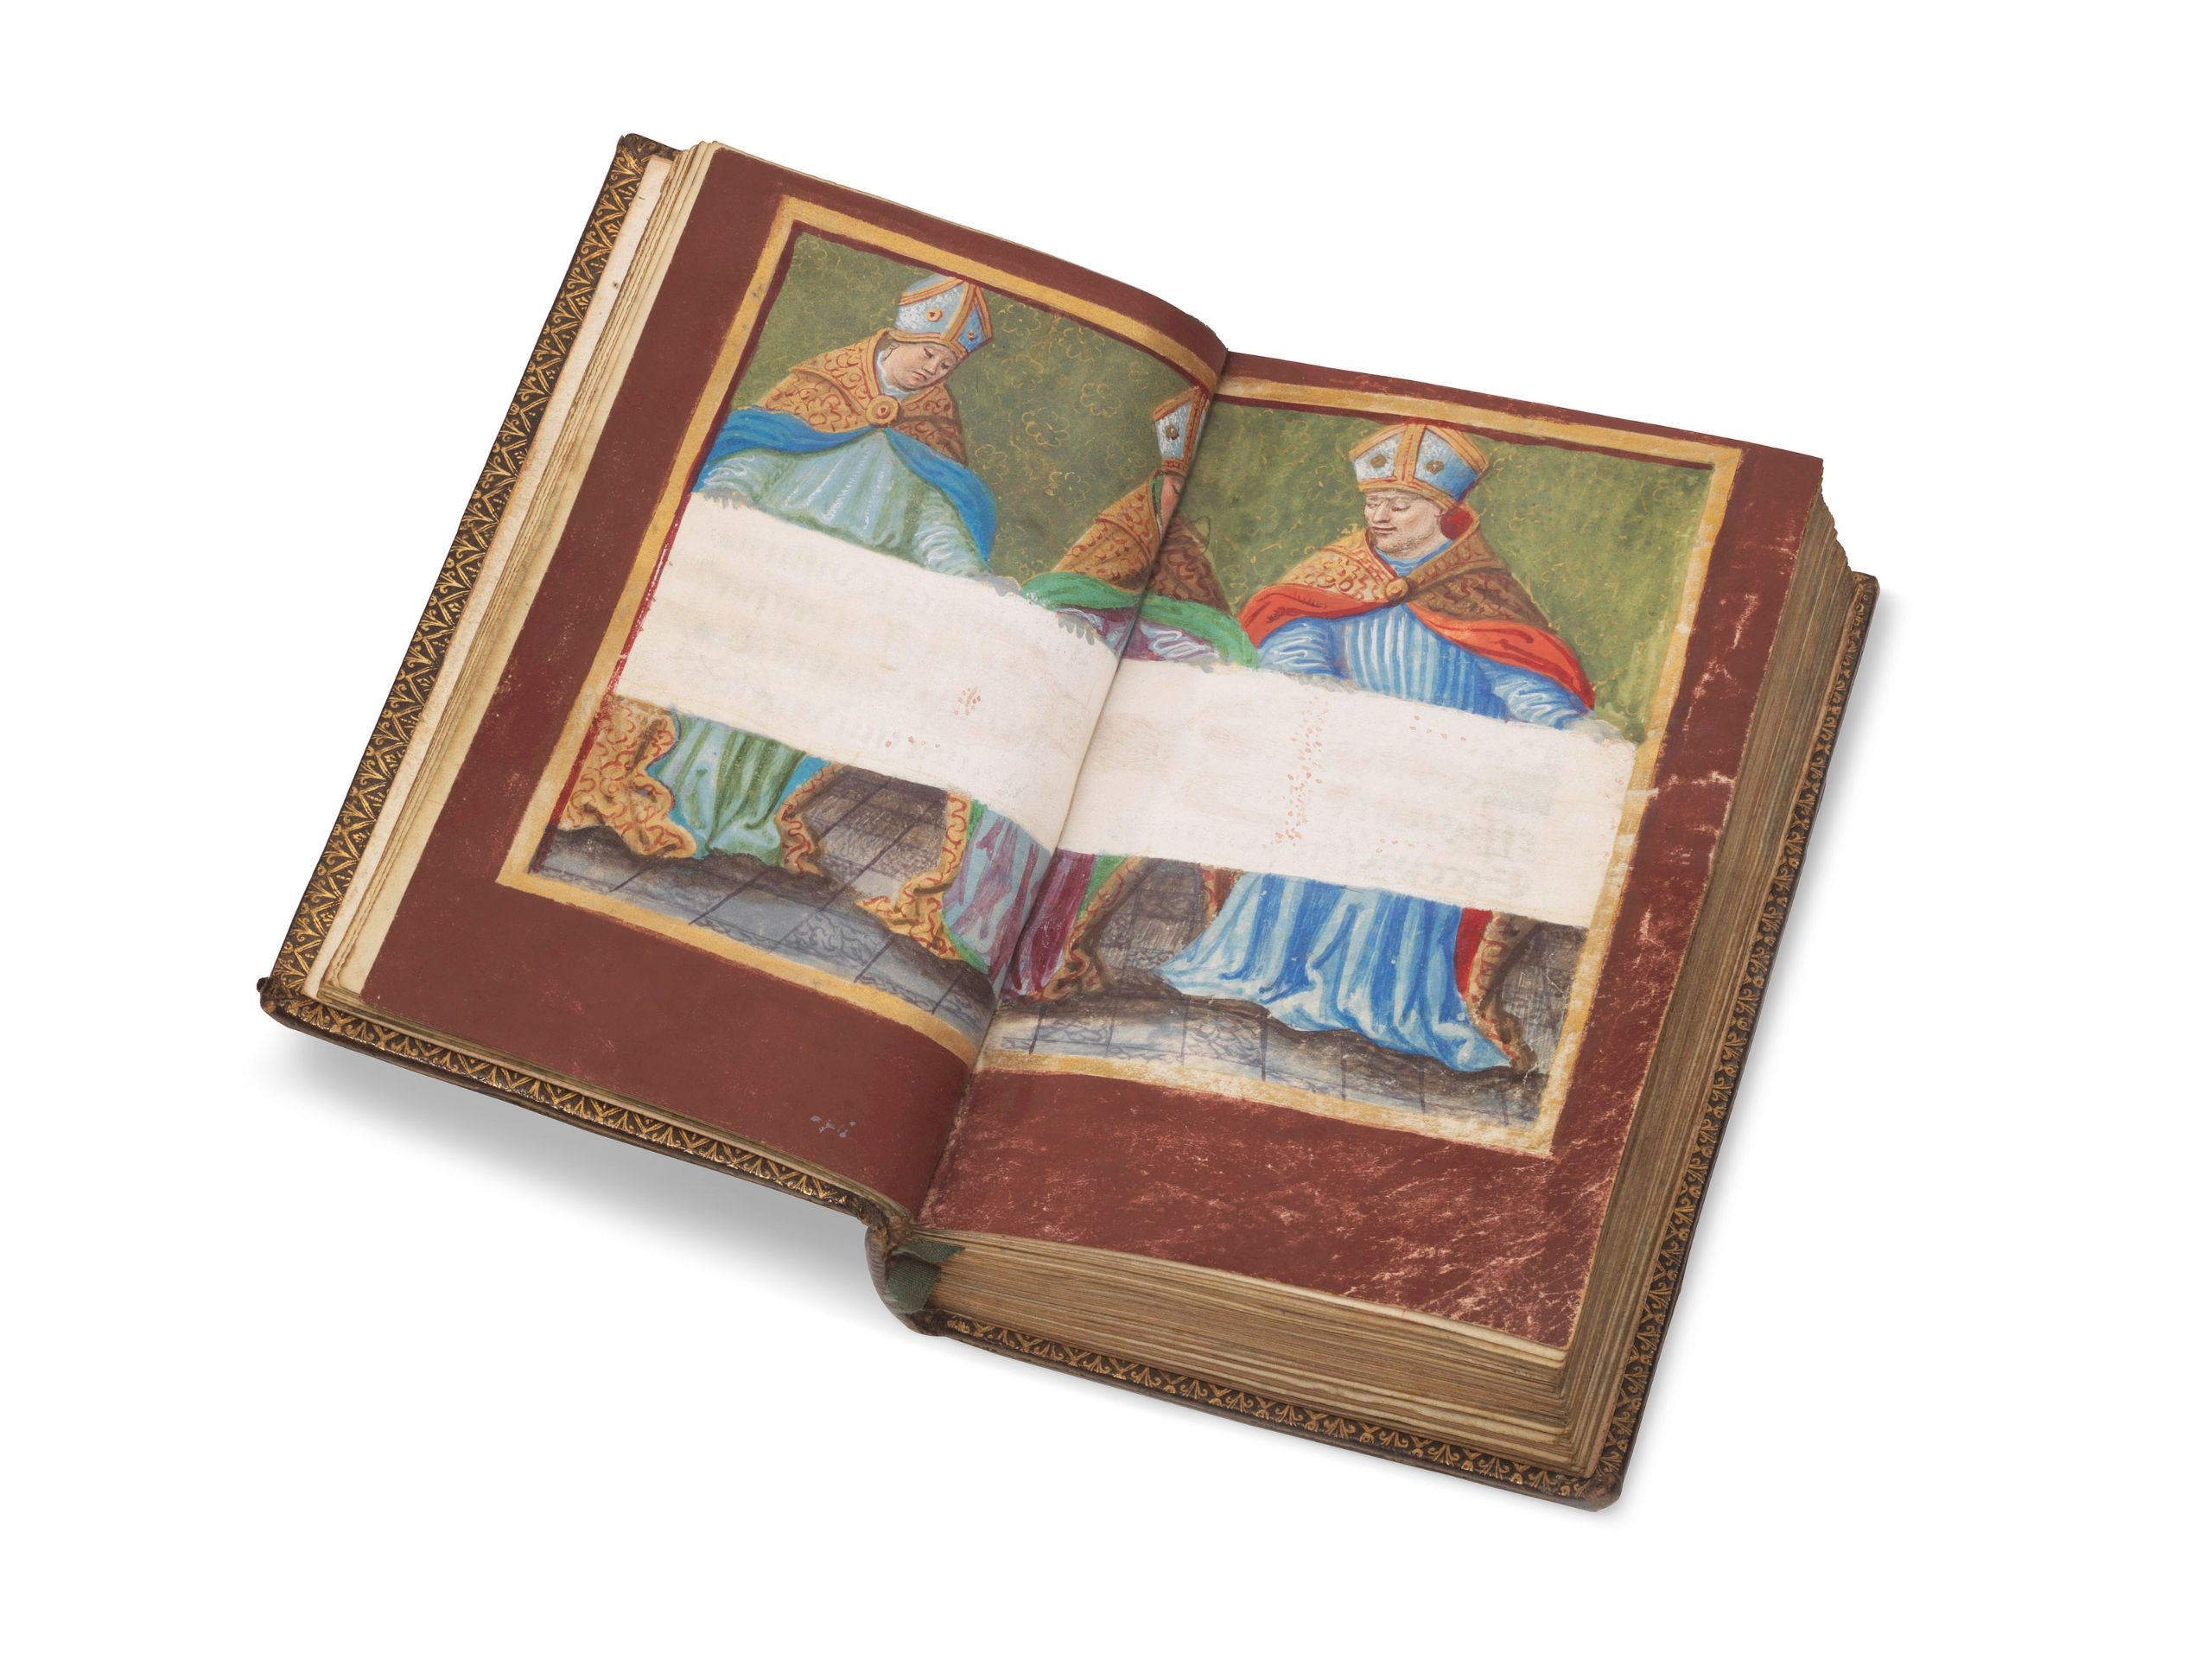 Photo 1. Prayer Book with Shroud